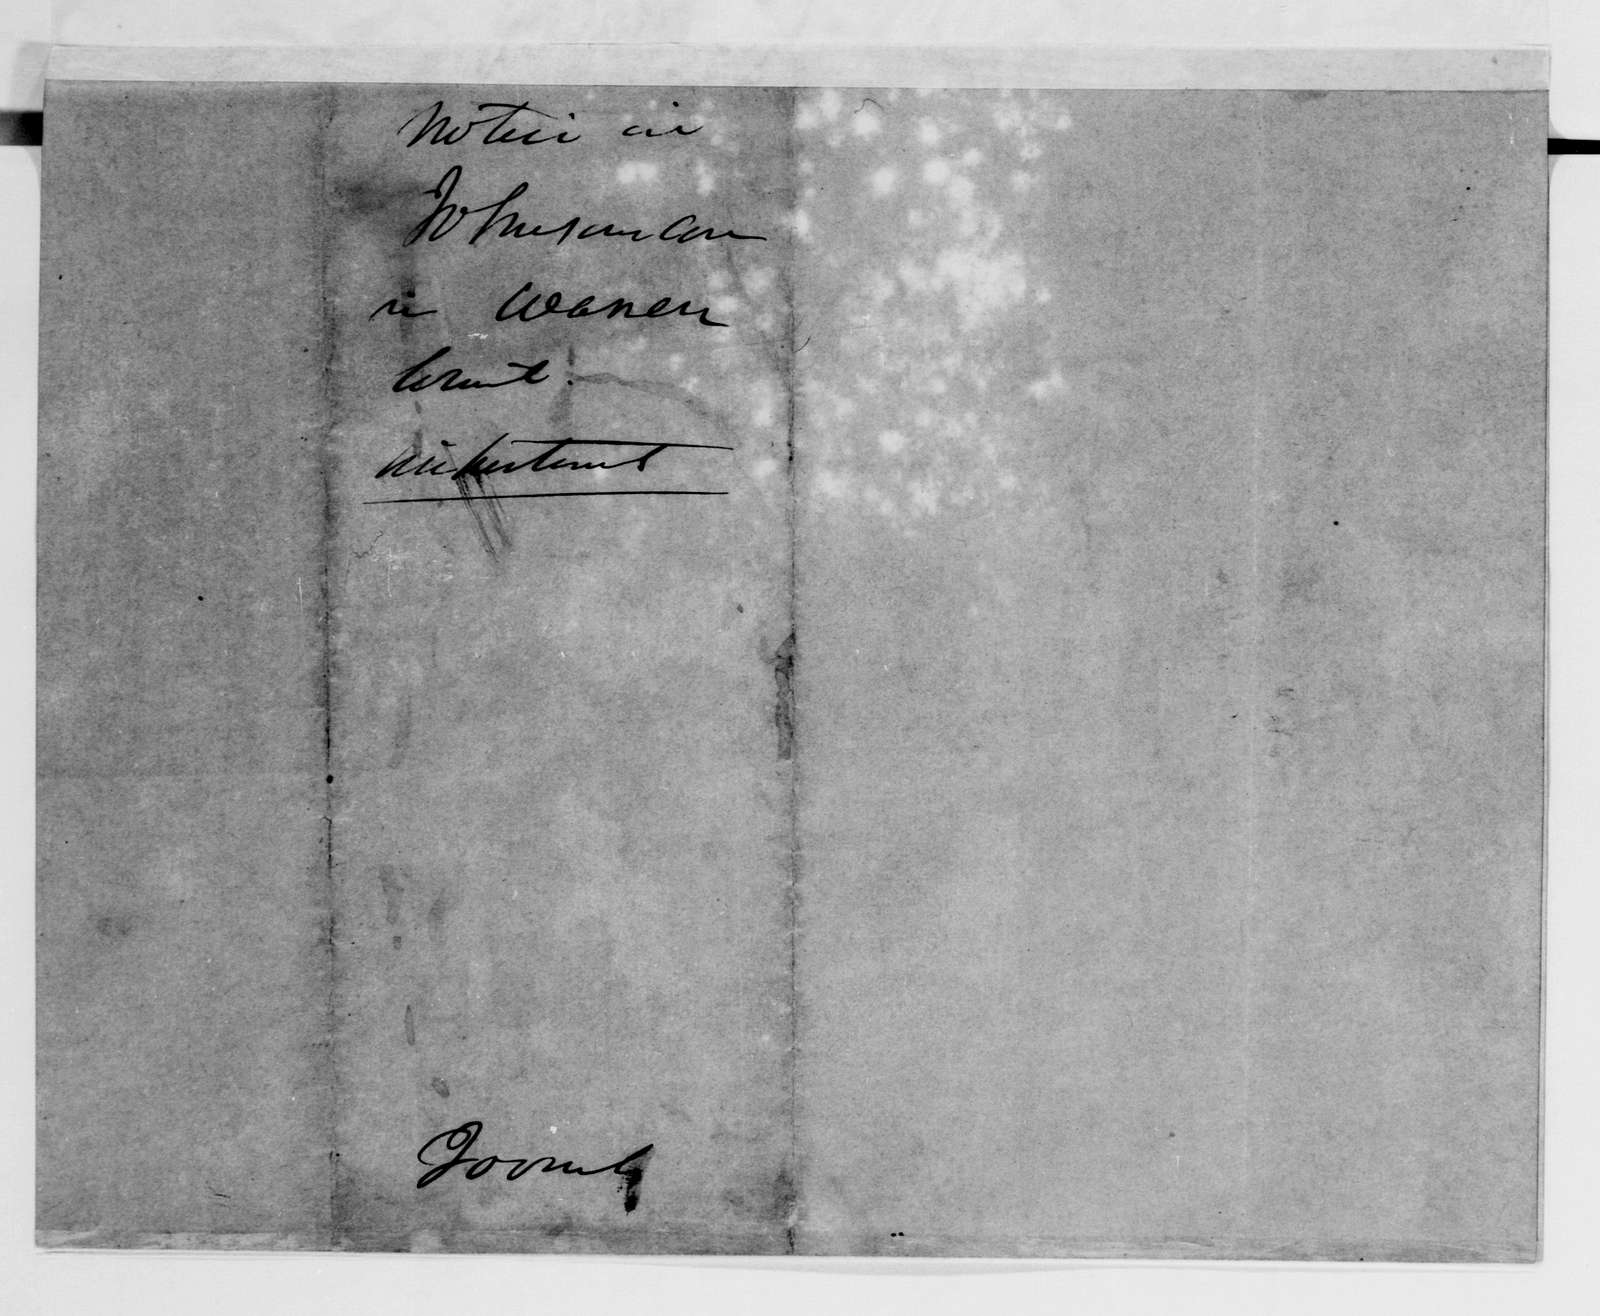 Alexander Hamilton Stephens Papers: General Correspondence, 1784-1886; 1852, Oct. 15-1855, Dec. 27